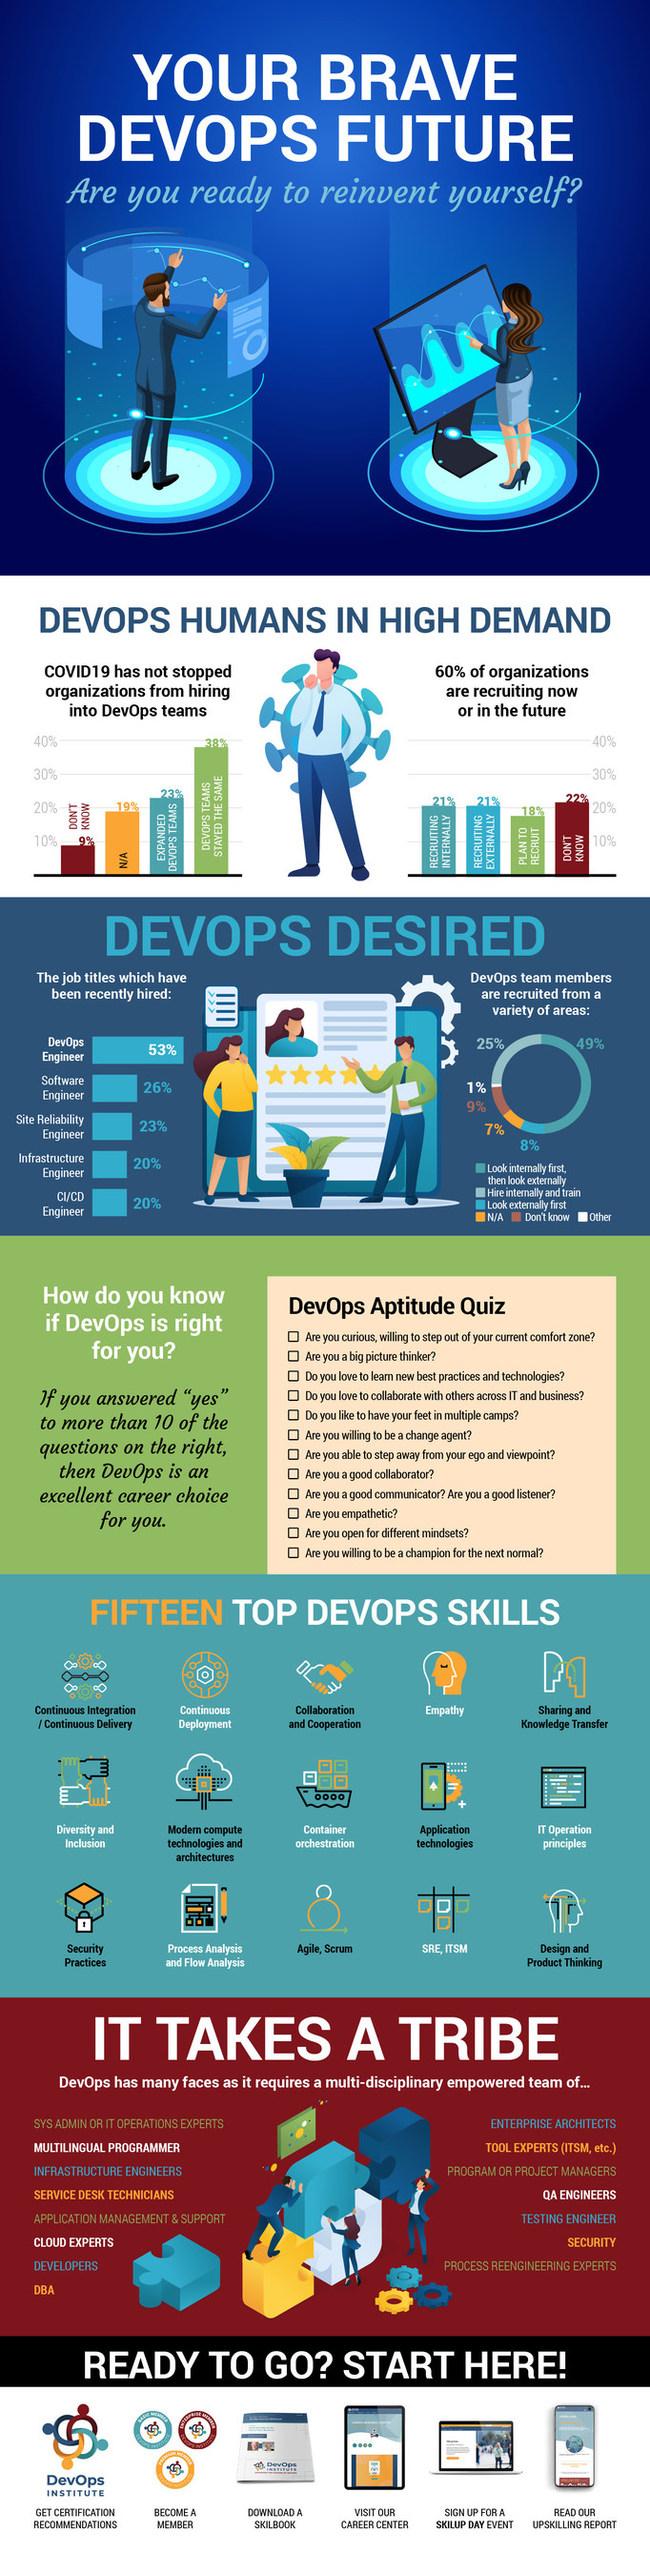 Infographic Source: DevOps Institute, 'Upskilling 2021: Enterprise DevOps Skills Report'. Learn more at https://devopsinstitute.com/.